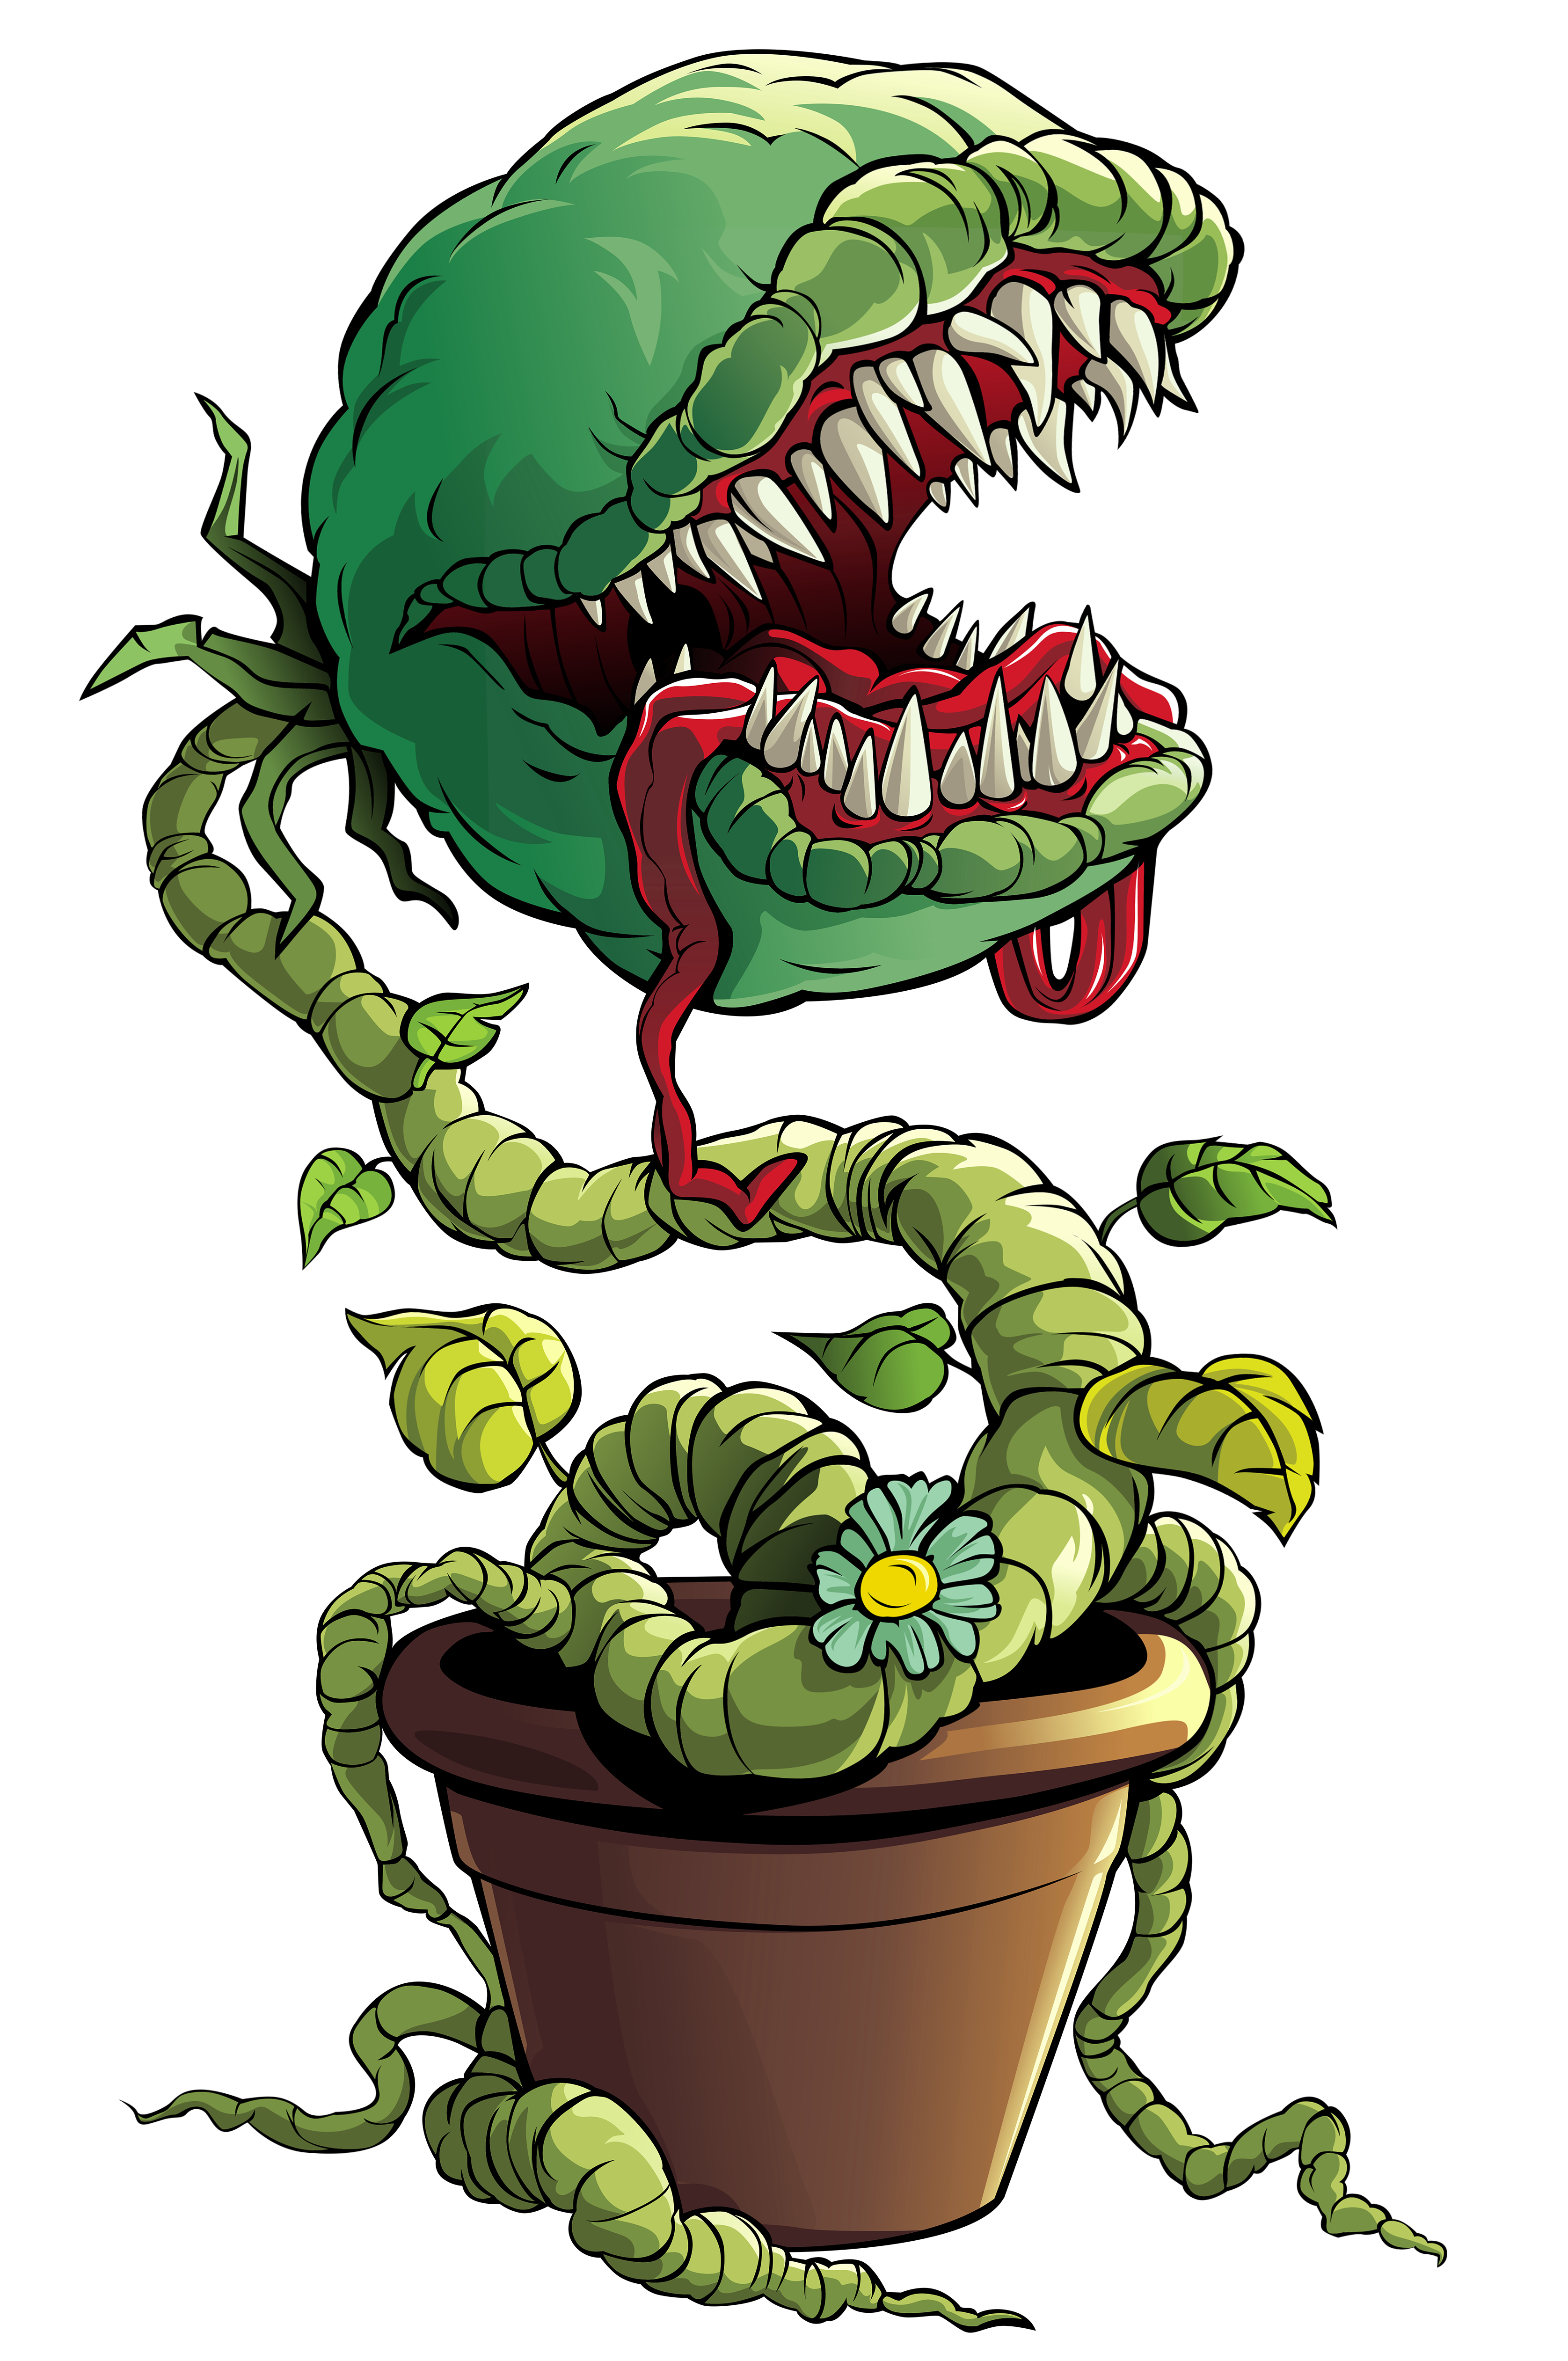 Venus trap plant monster. Fly clipart summer